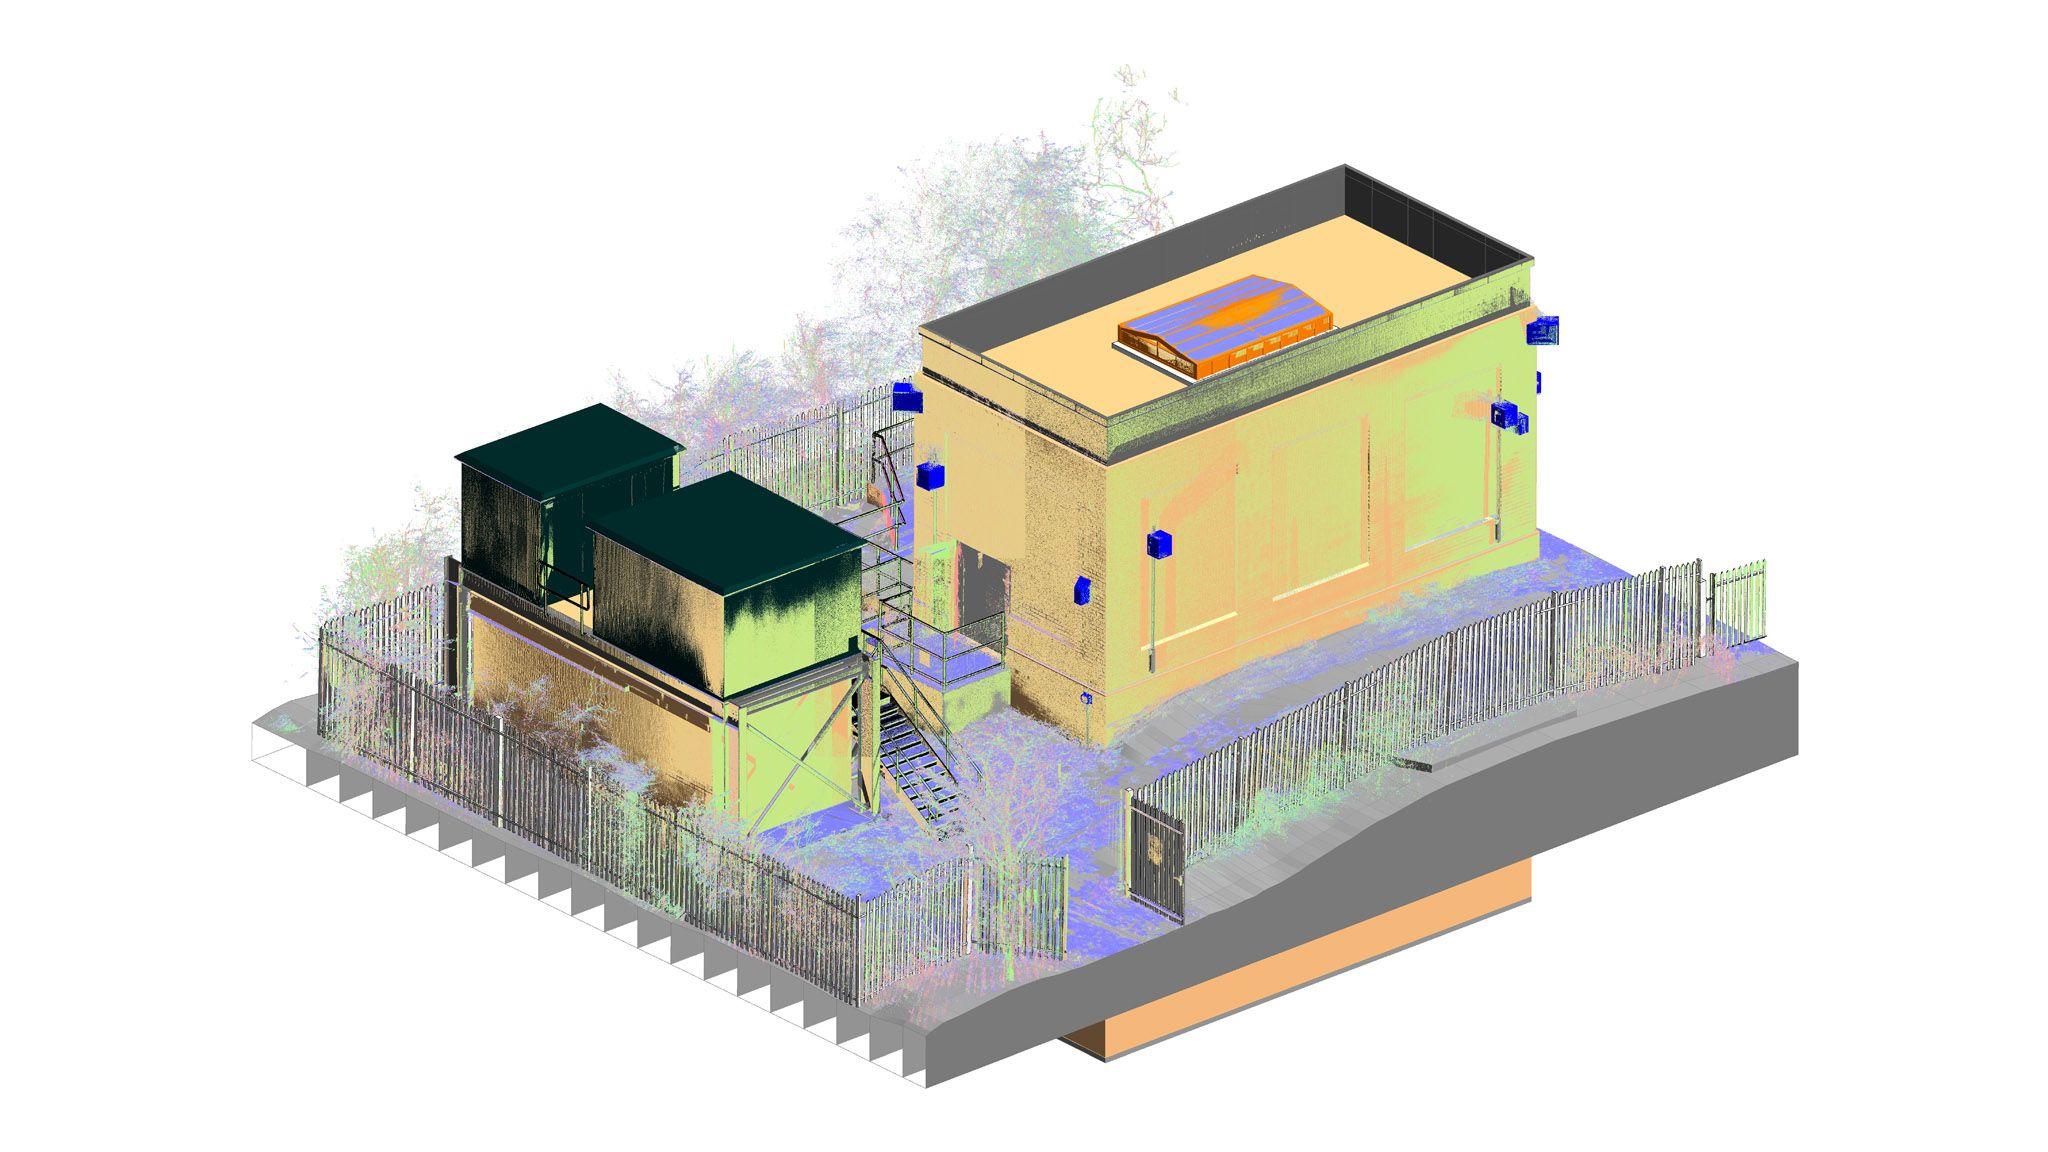 3d Laser Scan 3d Model Of A Water Pumping Station Scan2bim 3d Model Model Scan